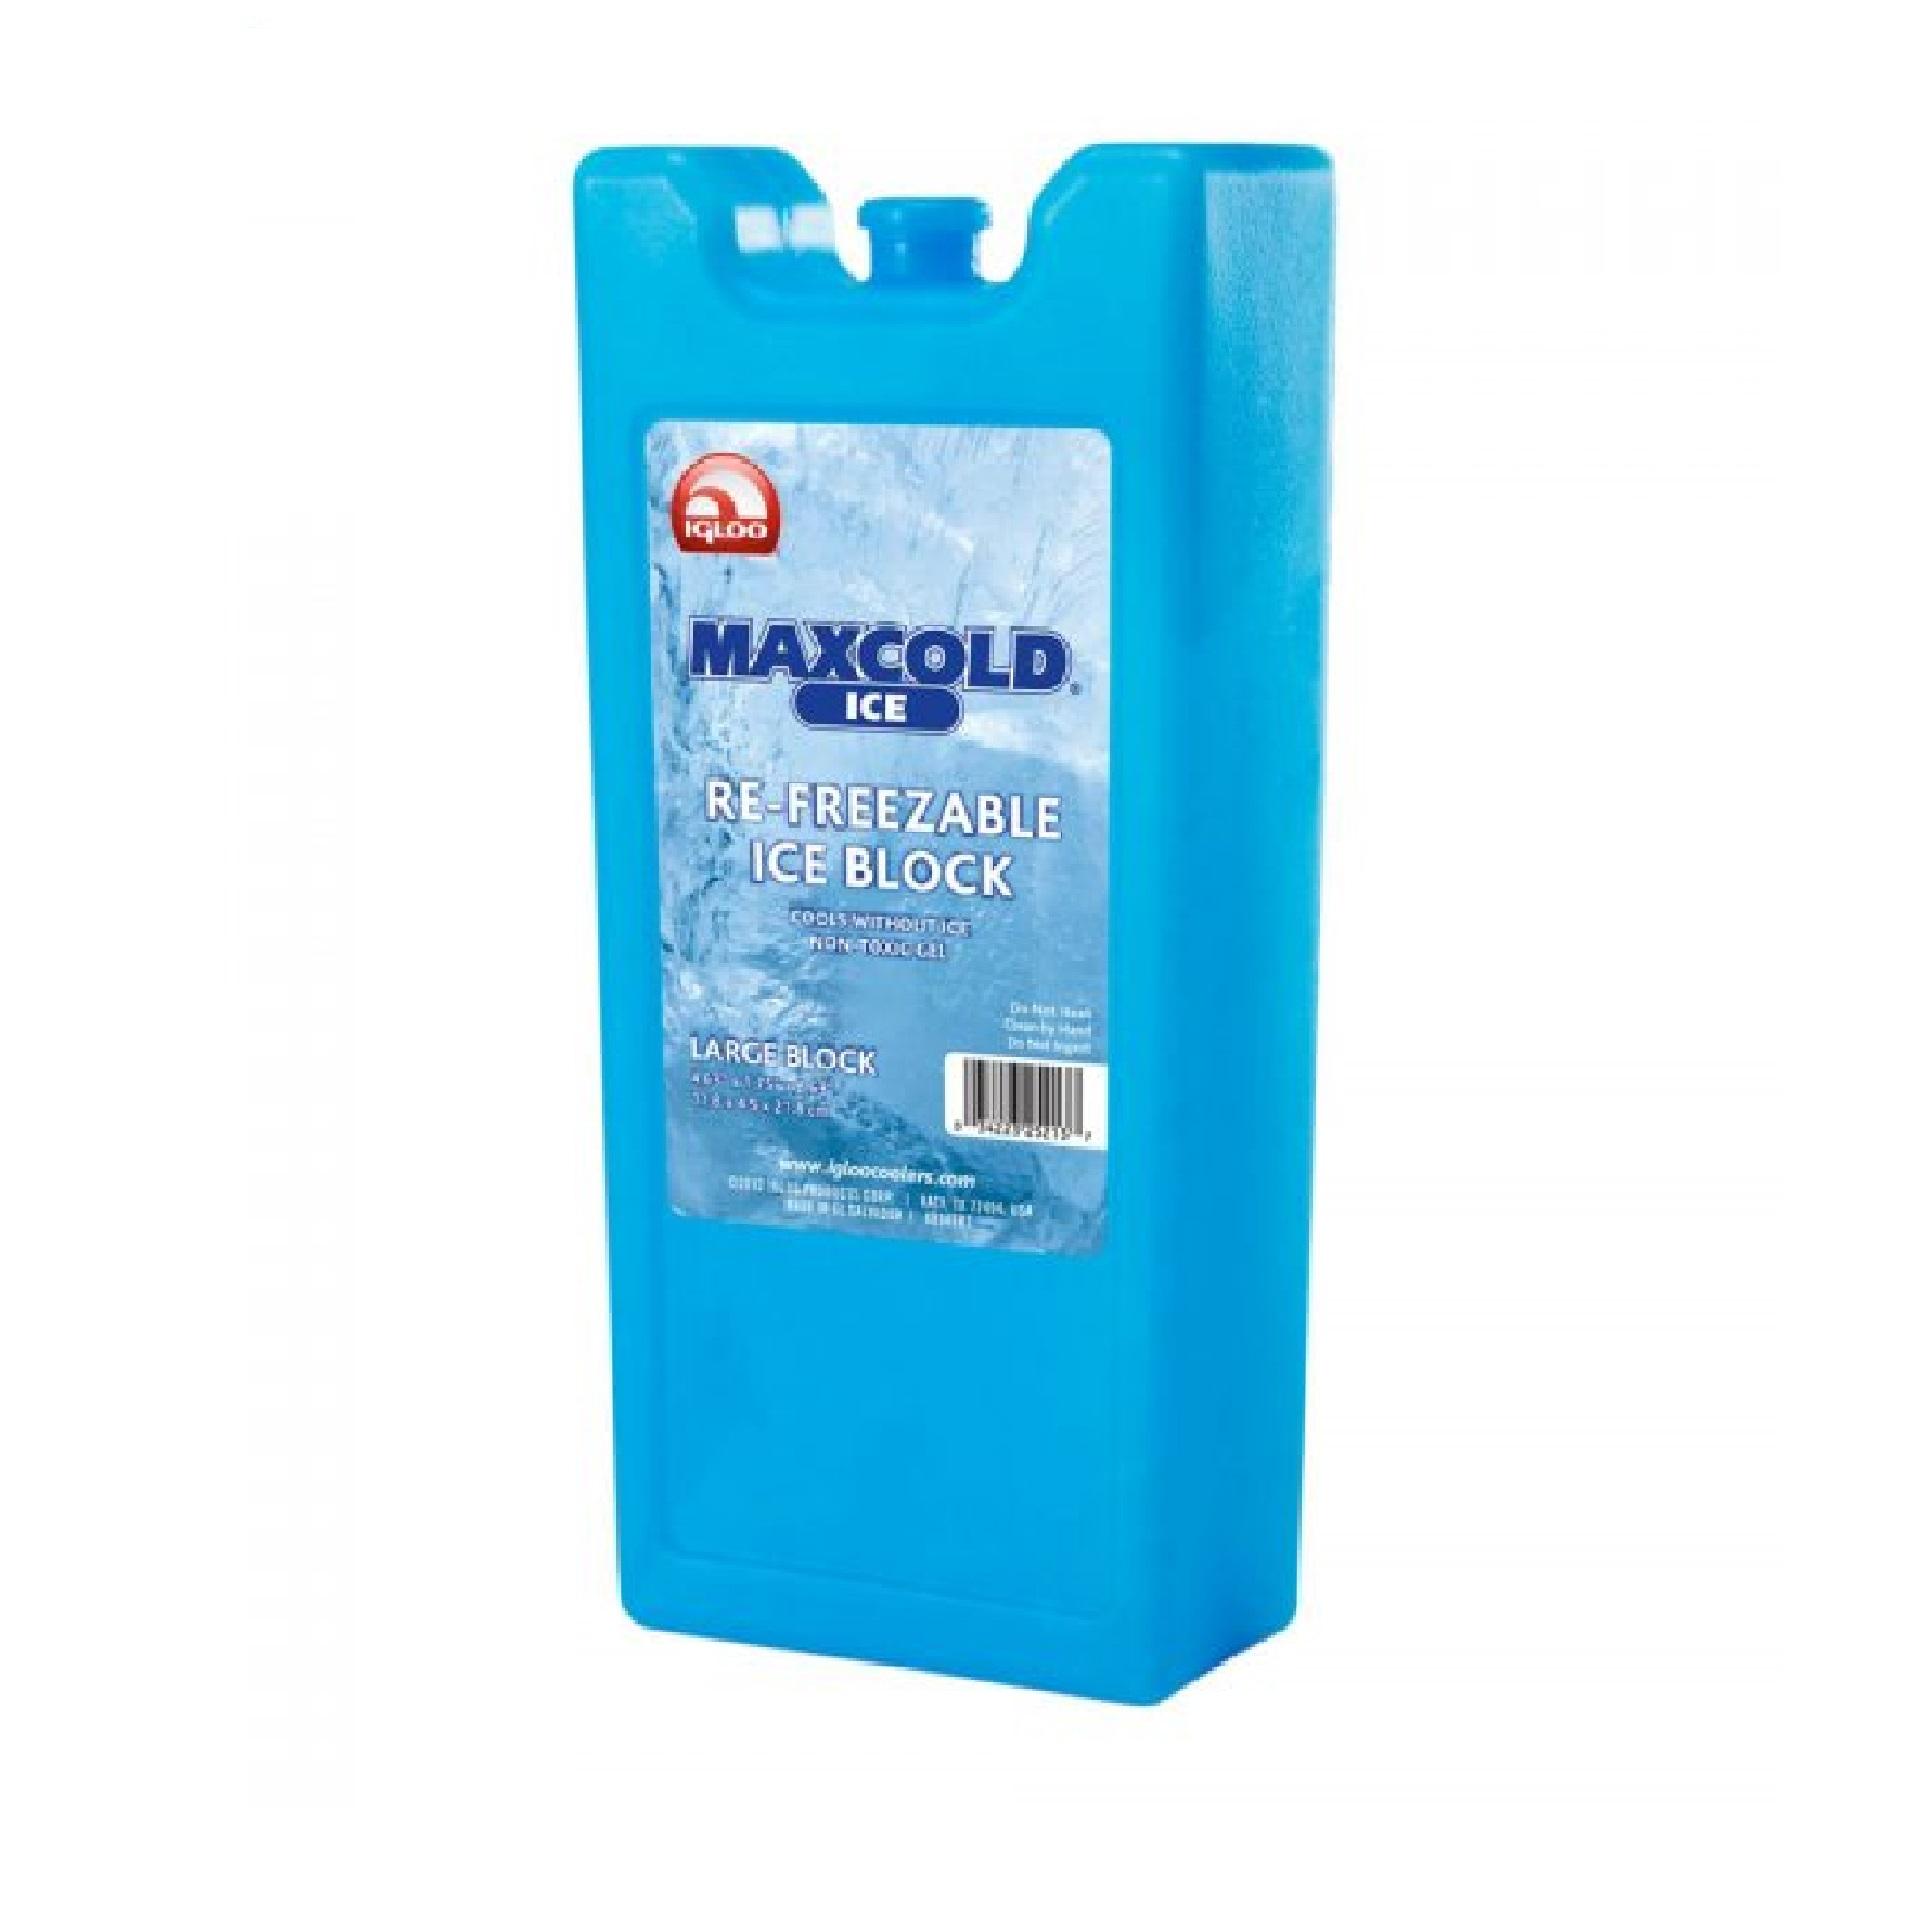 IGLOO Maxcold Ice Freezer Block Large